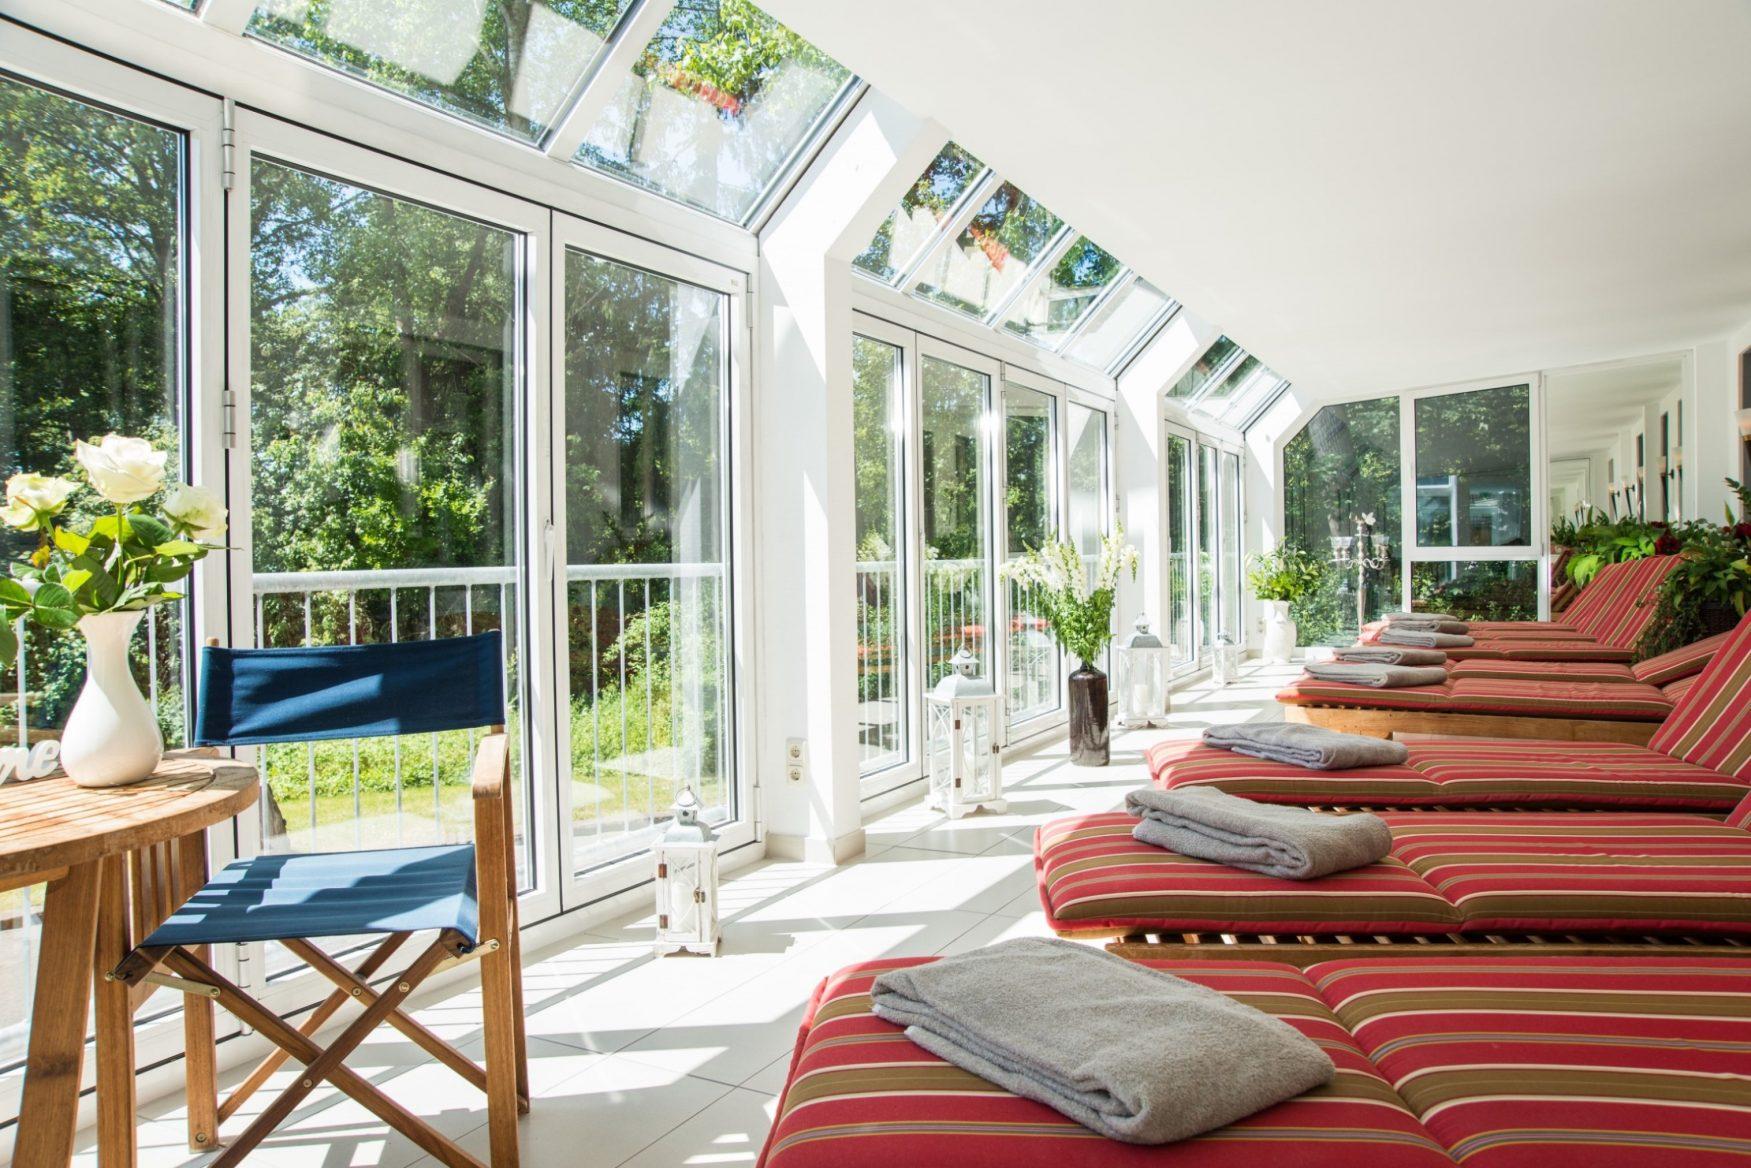 BEST WESTERN Seehotel Frankenhorst - Ruhebereich Foto: Raphael Hotels